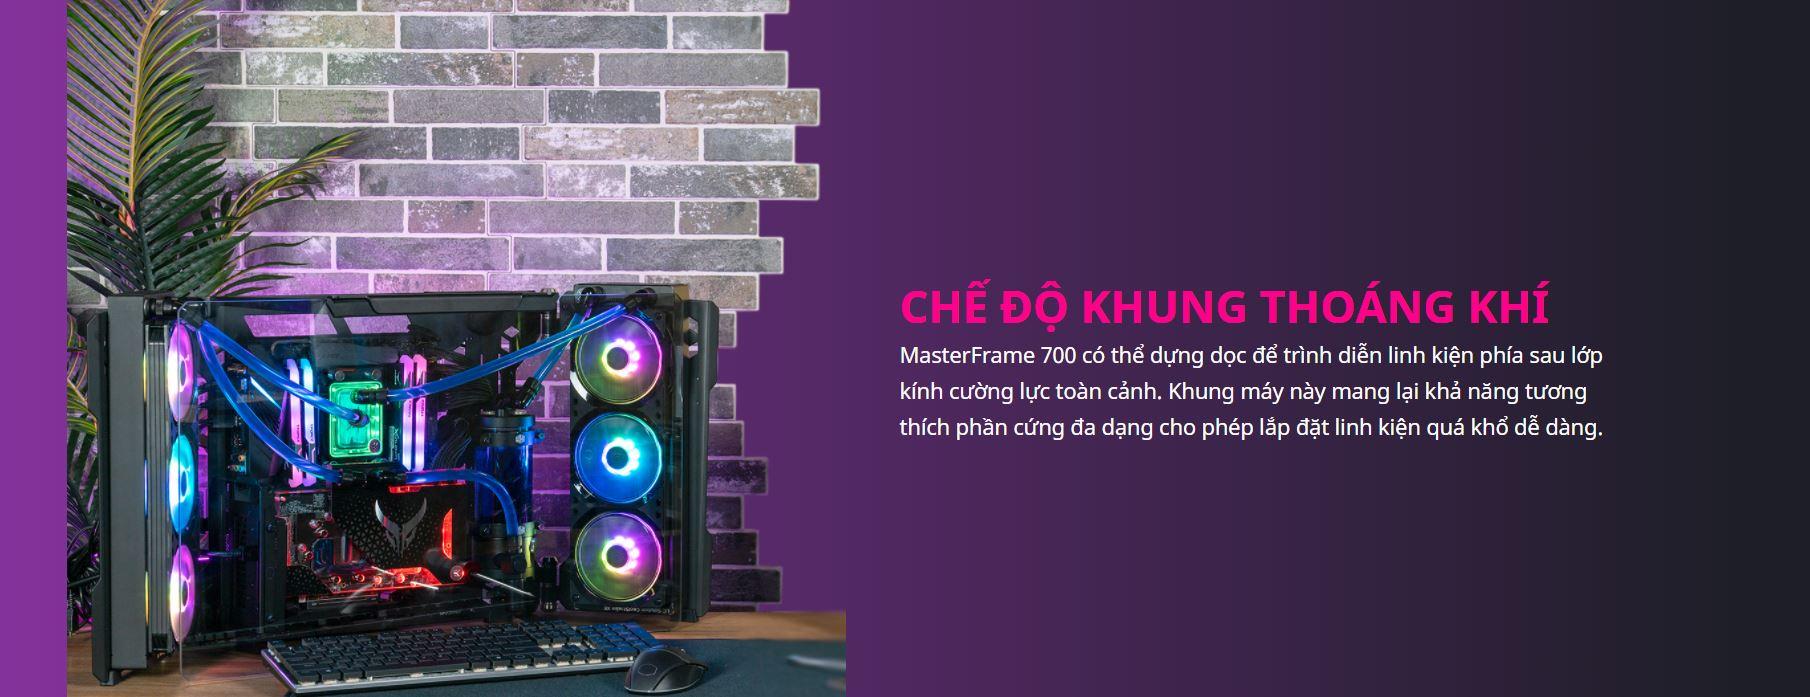 Vỏ Case Cooler Master MasterFrame 700 (Full Tower/Màu Đen) giới thiệu 3